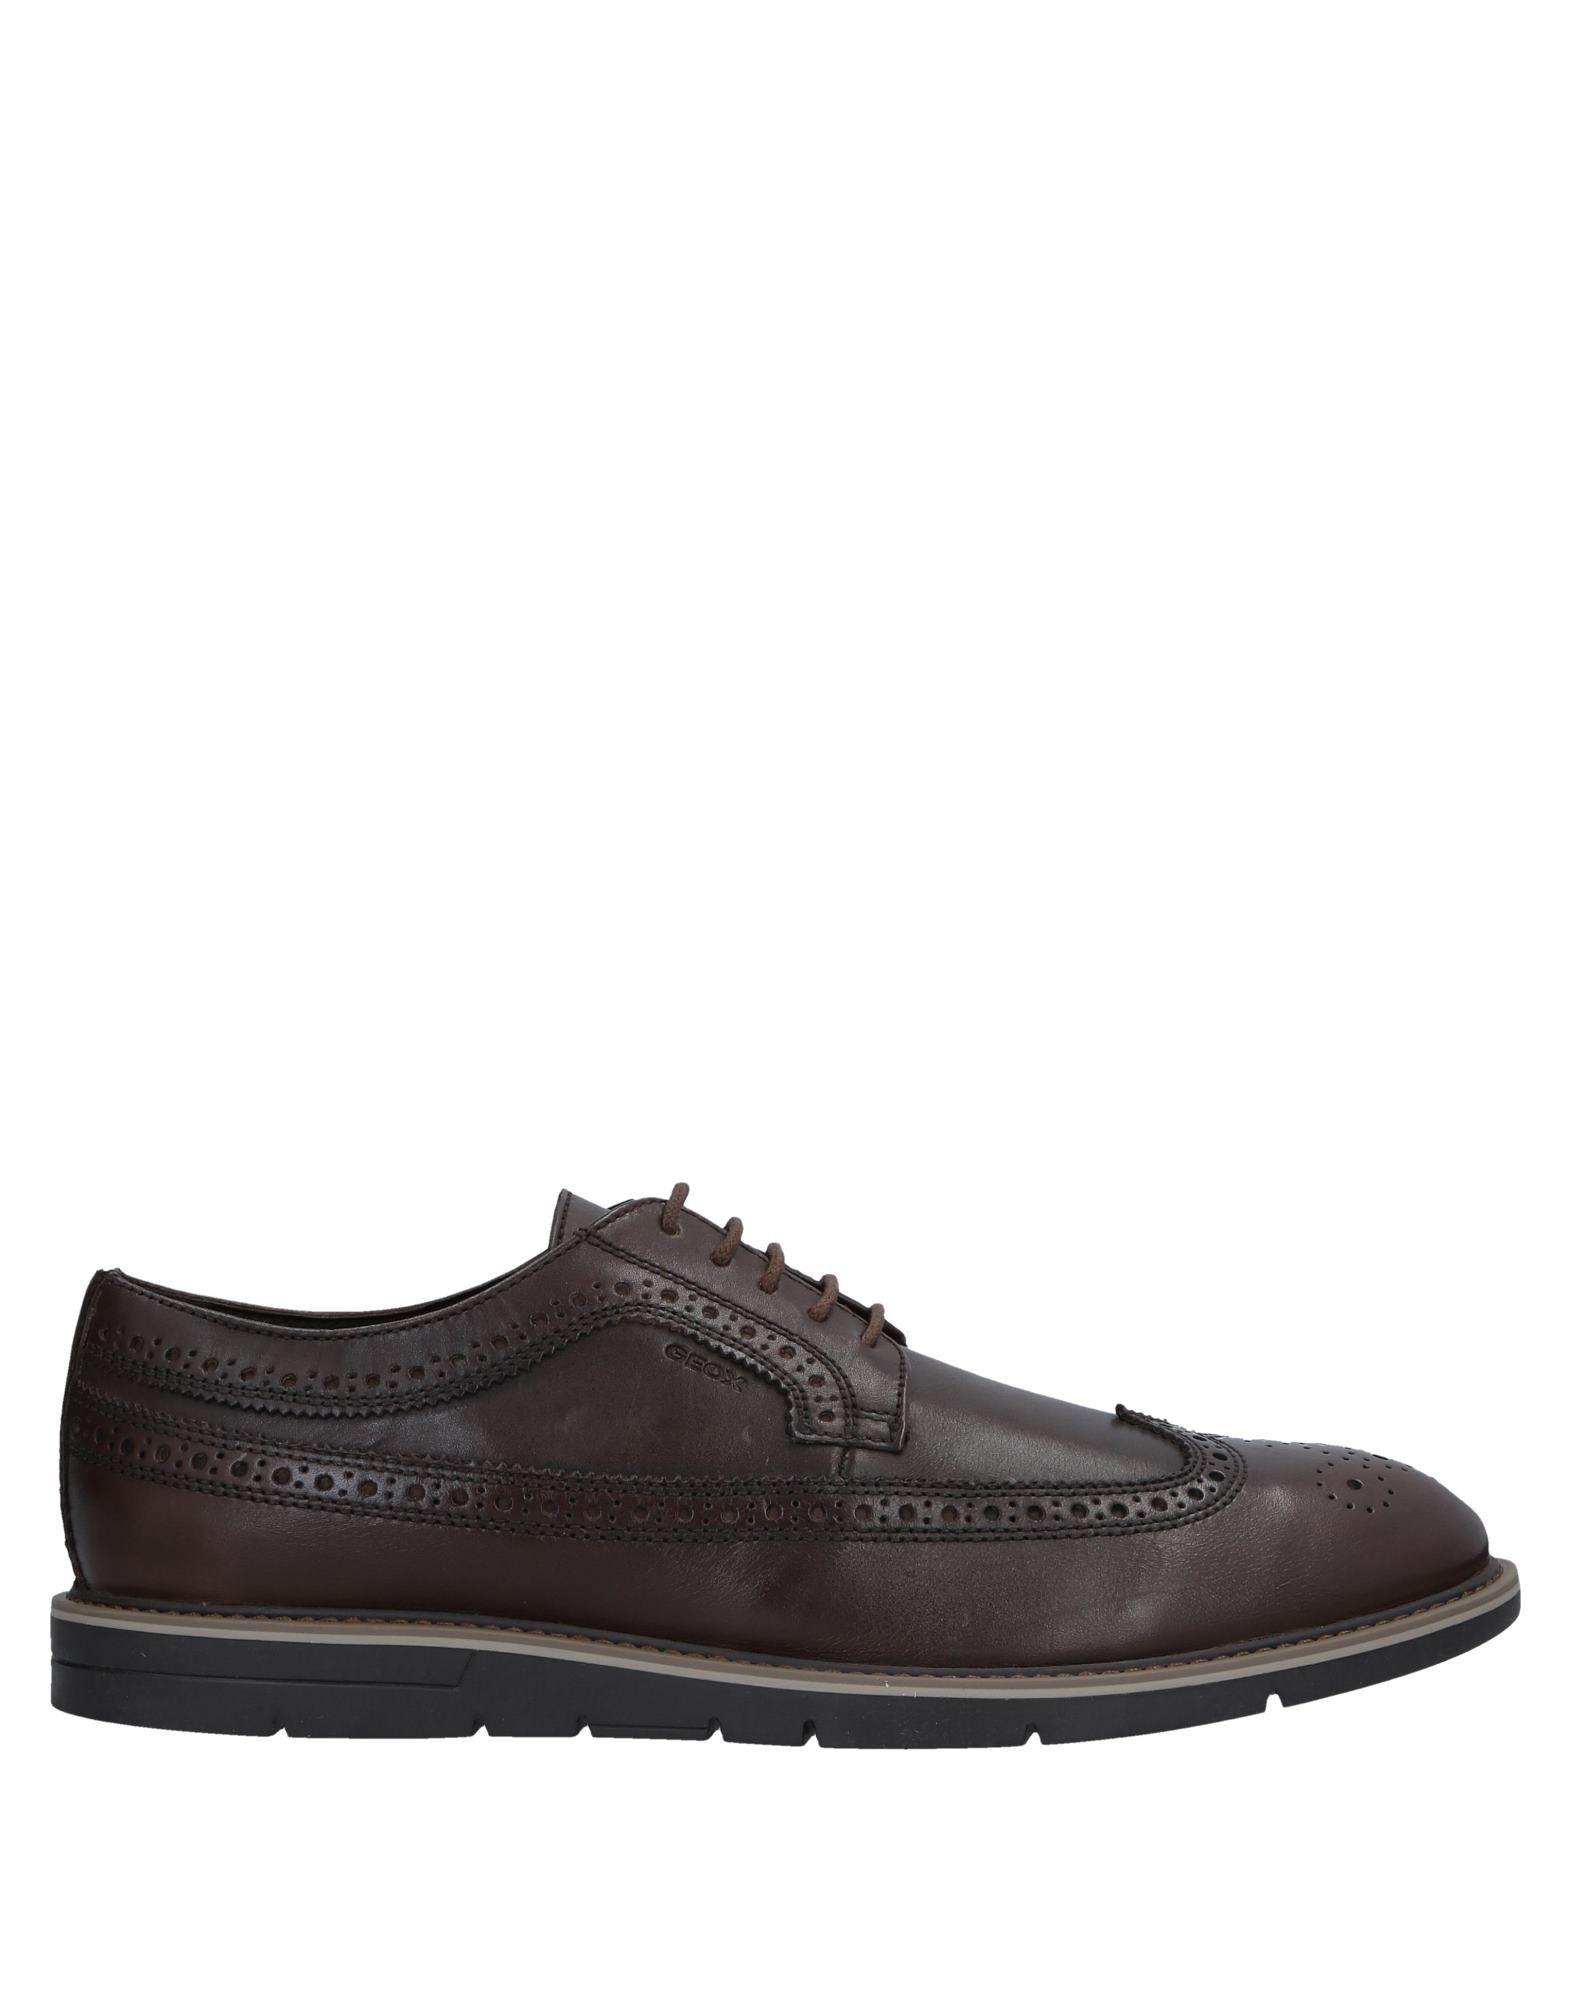 GEOX Обувь на шнурках обувь